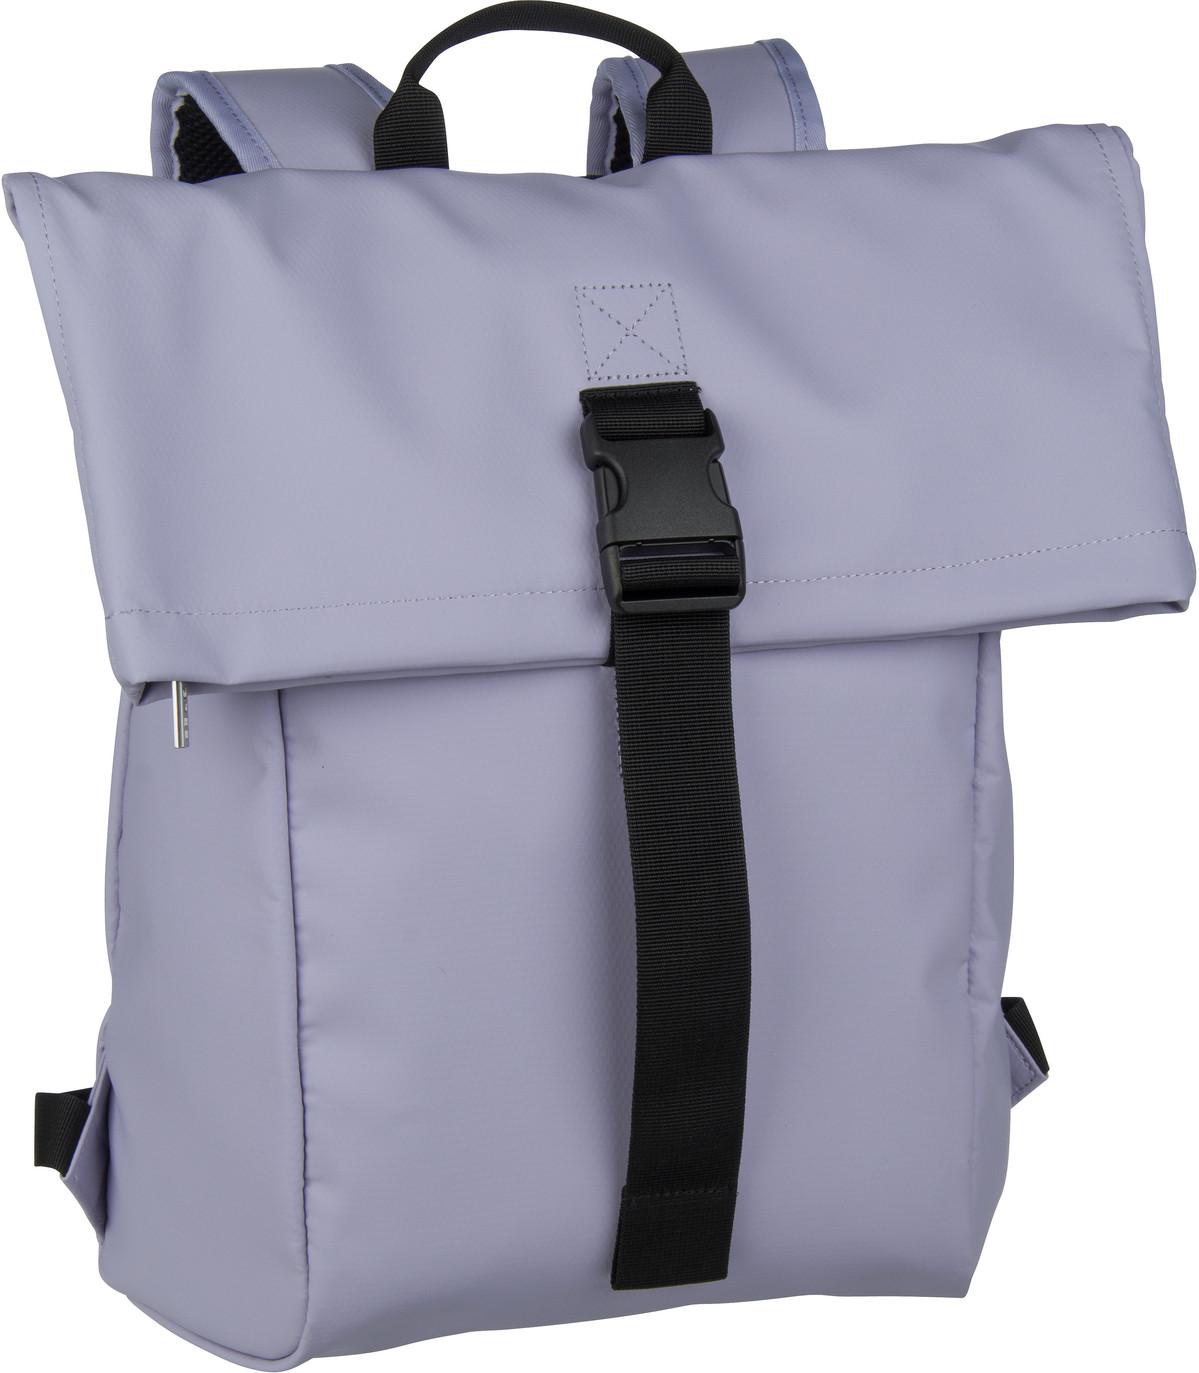 Rucksack / Daypack Punch 92 Lavender (13 Liter)